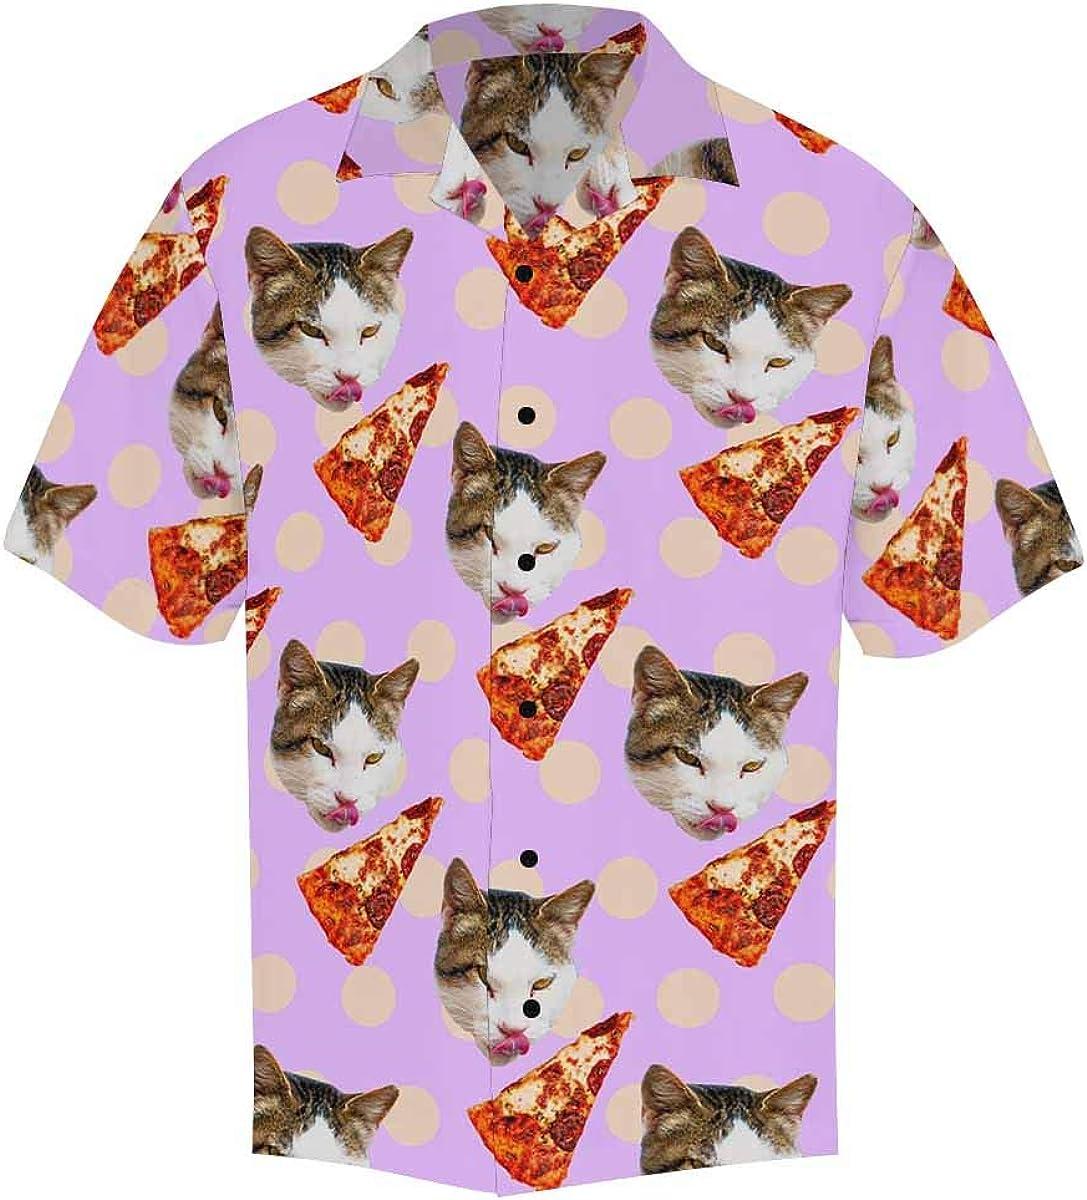 InterestPrint Men's Casual Button Down Short Sleeve Cute Funny Dog Hawaiian Shirt (S-5XL)